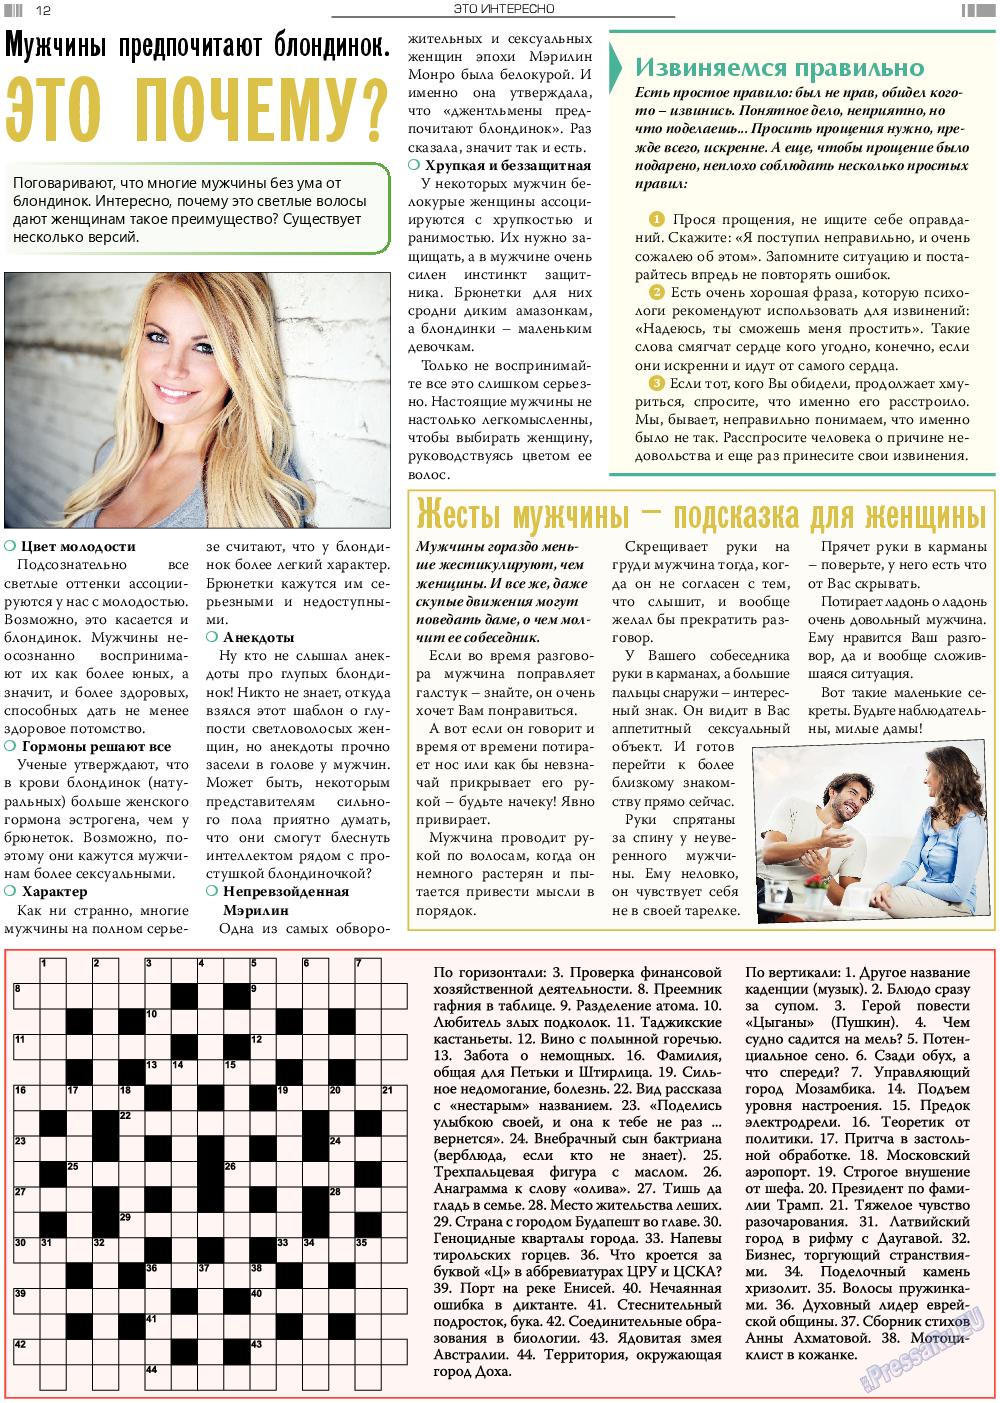 Анонс (газета). 2019 год, номер 10, стр. 12